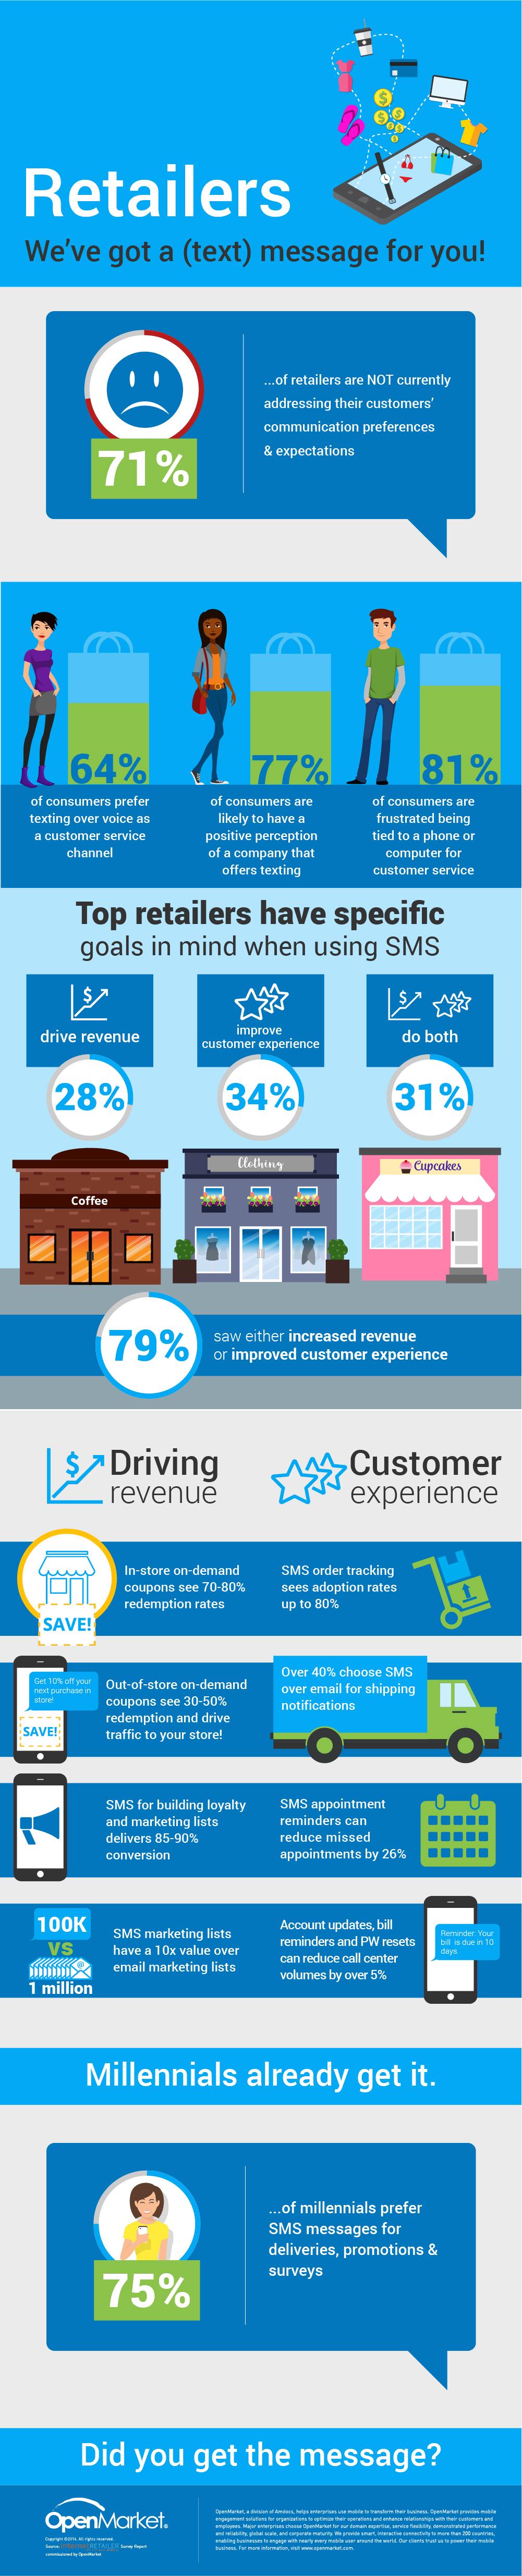 Retailer-Infographic